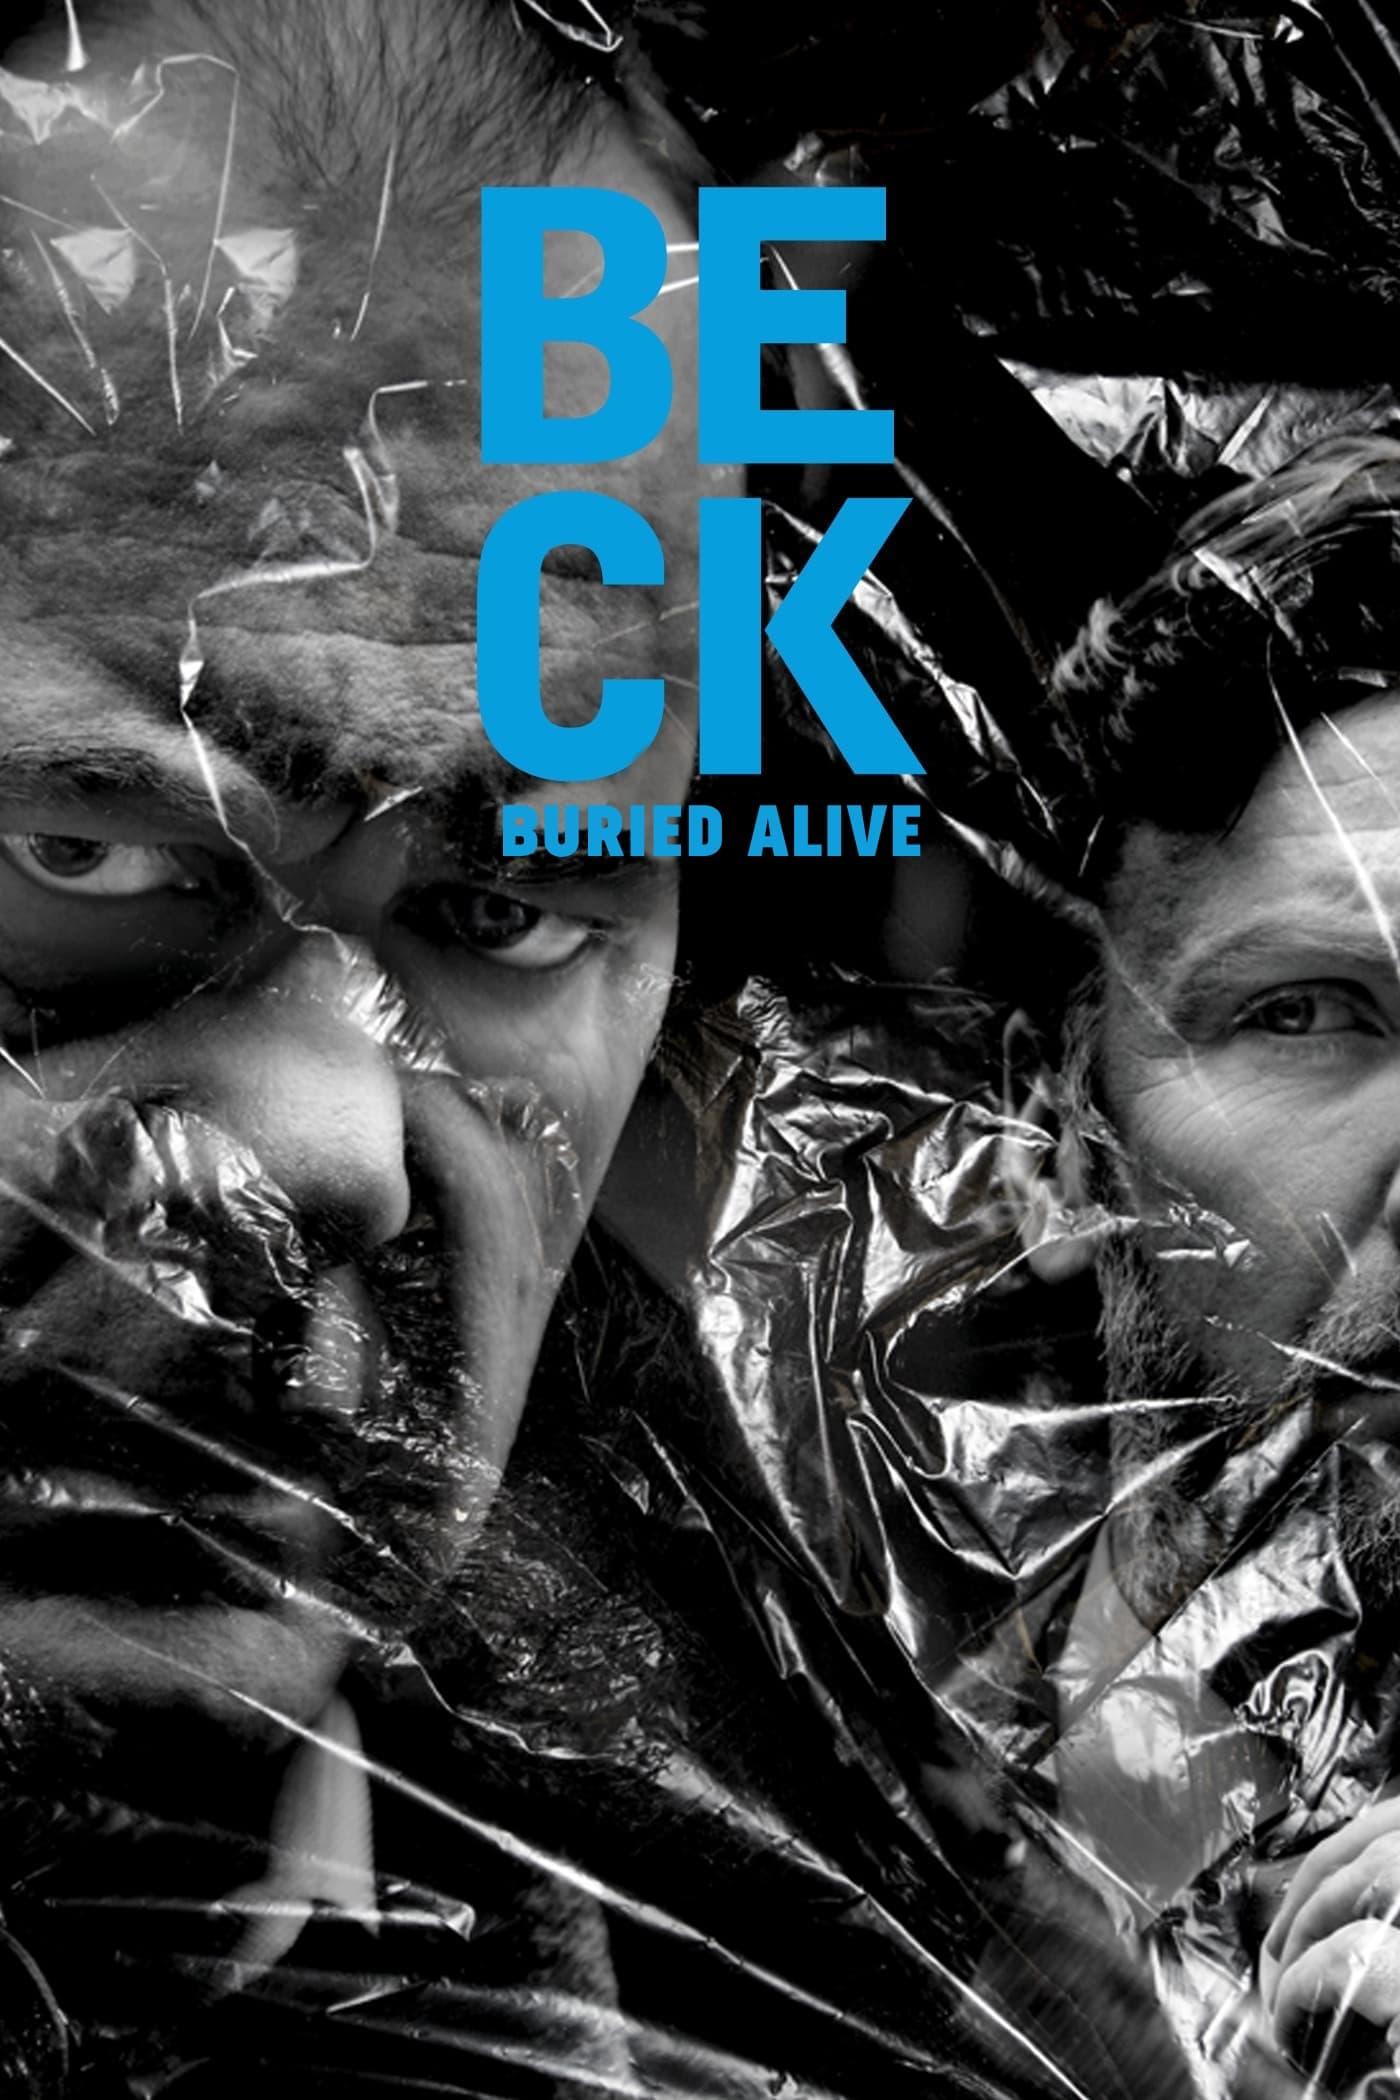 Beck 26 - Buried Alive